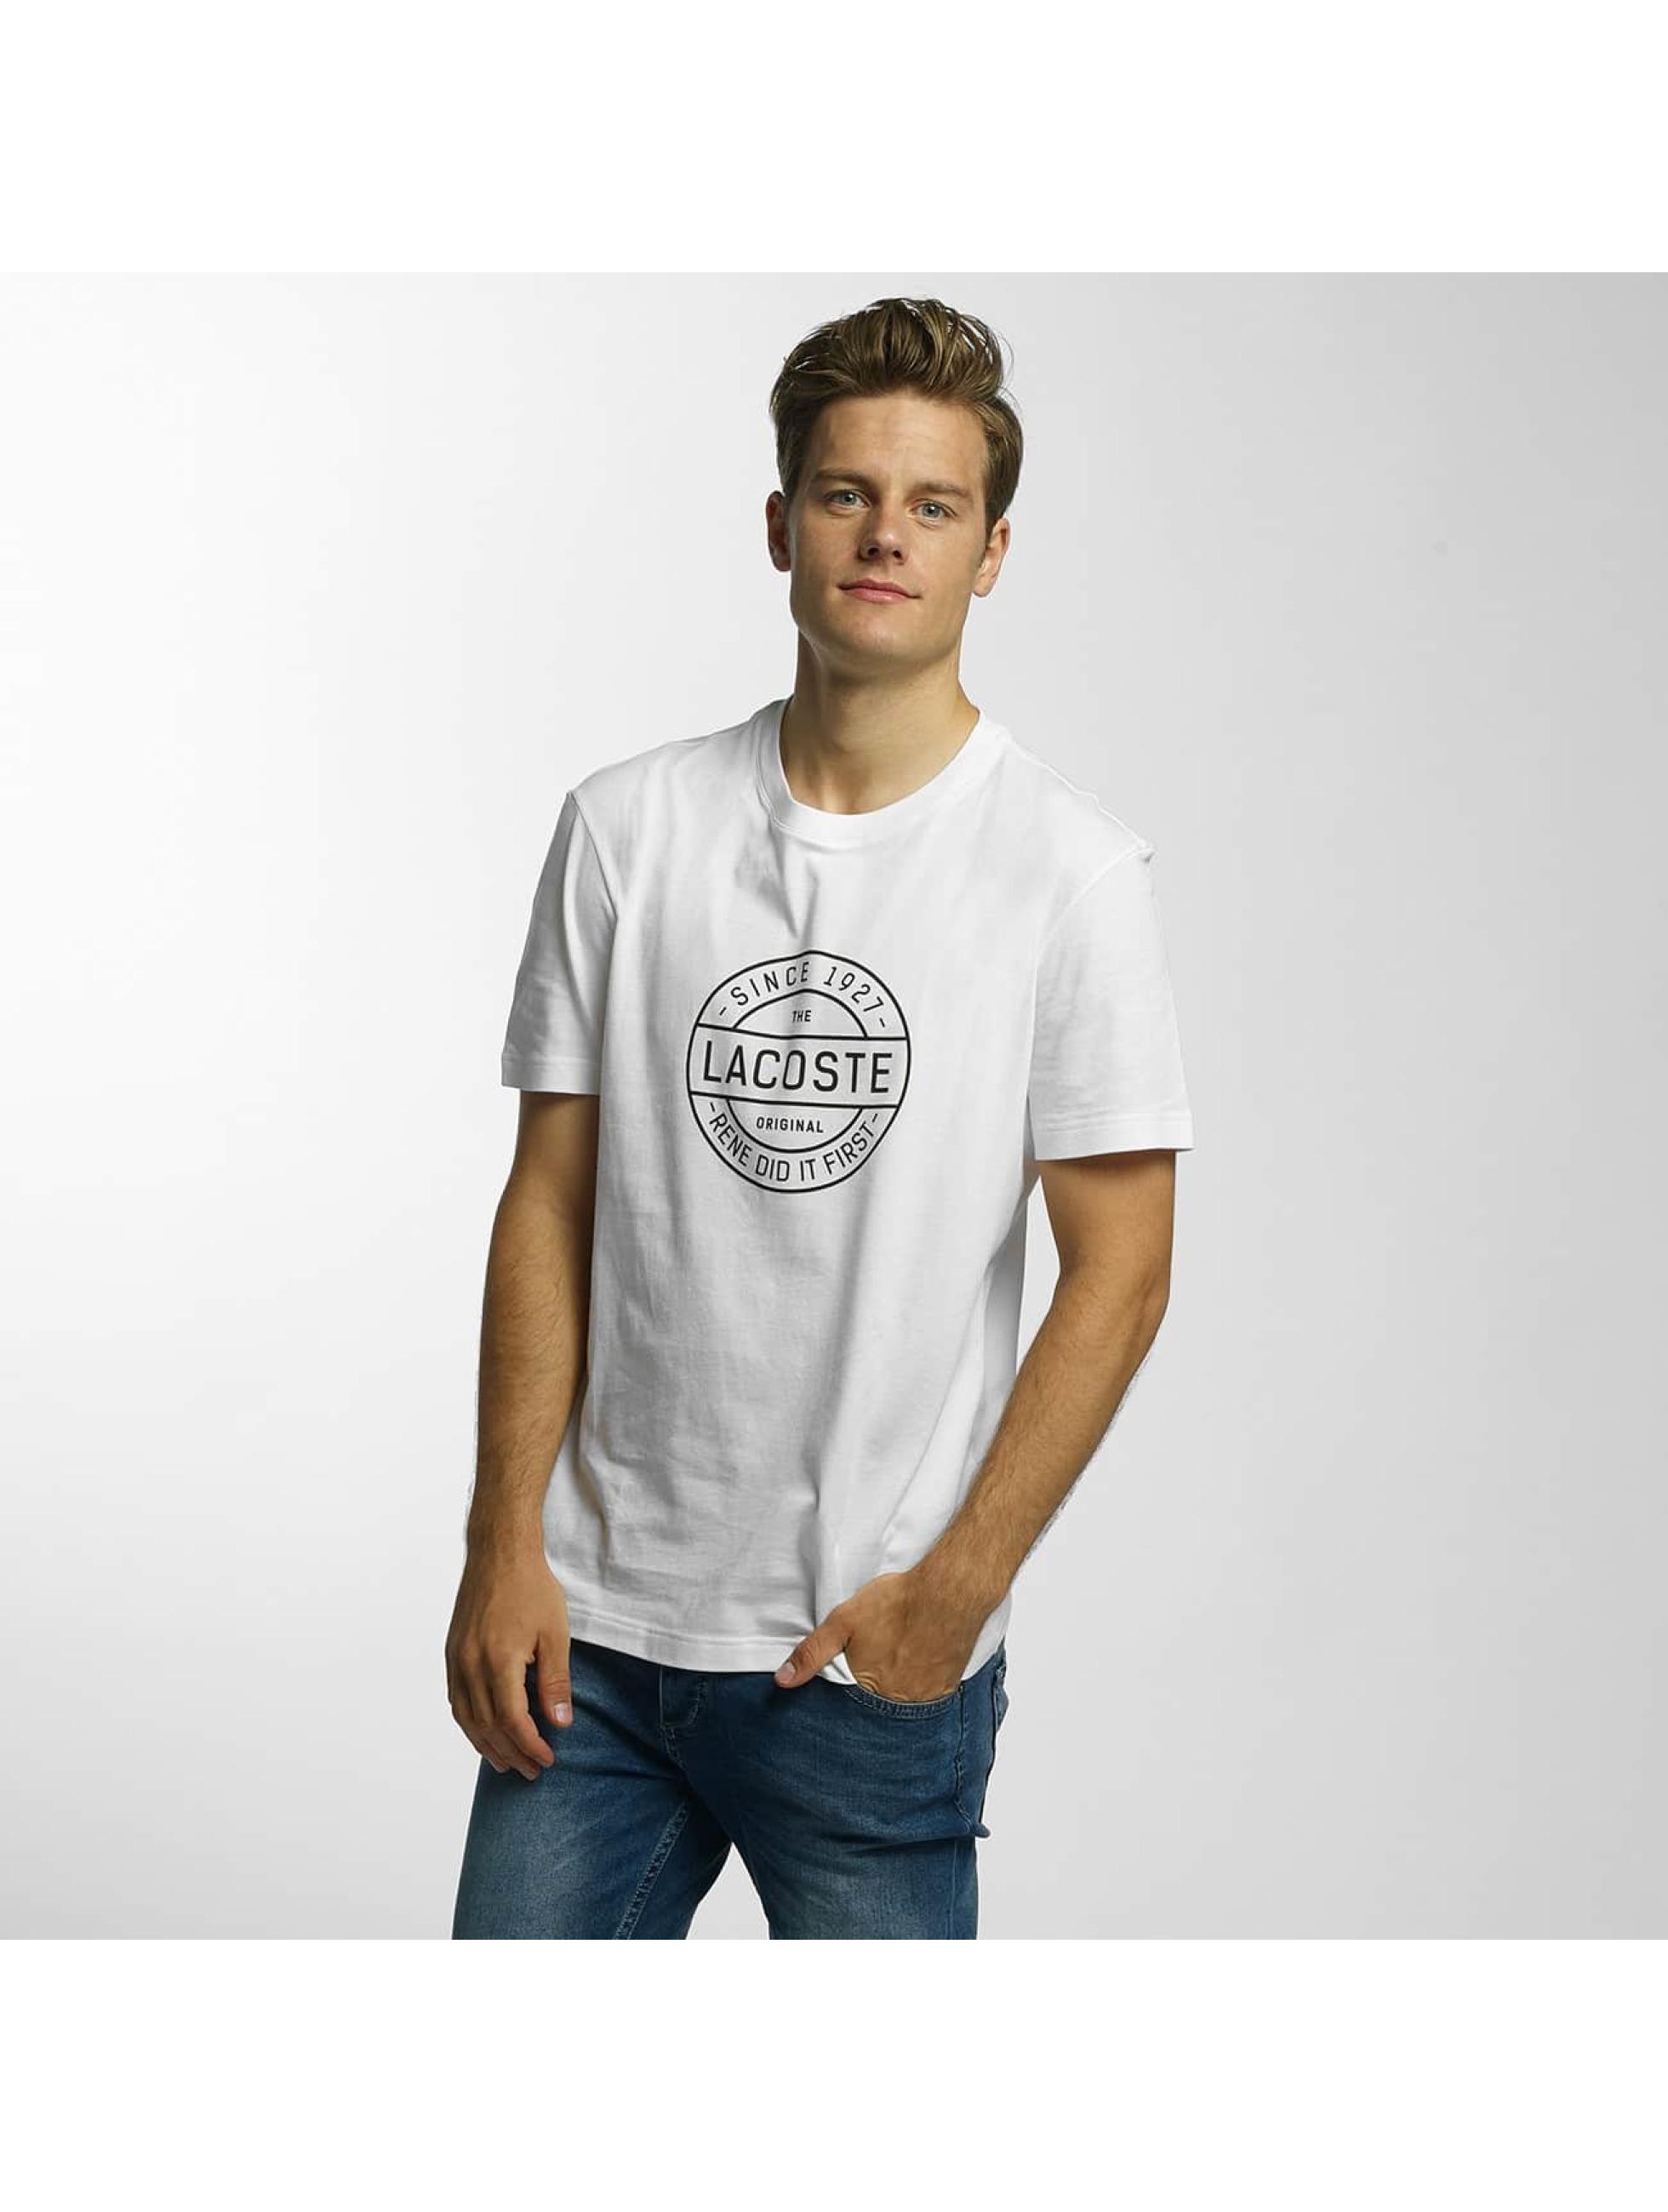 Lacoste Classic T-Shirt Original weiß